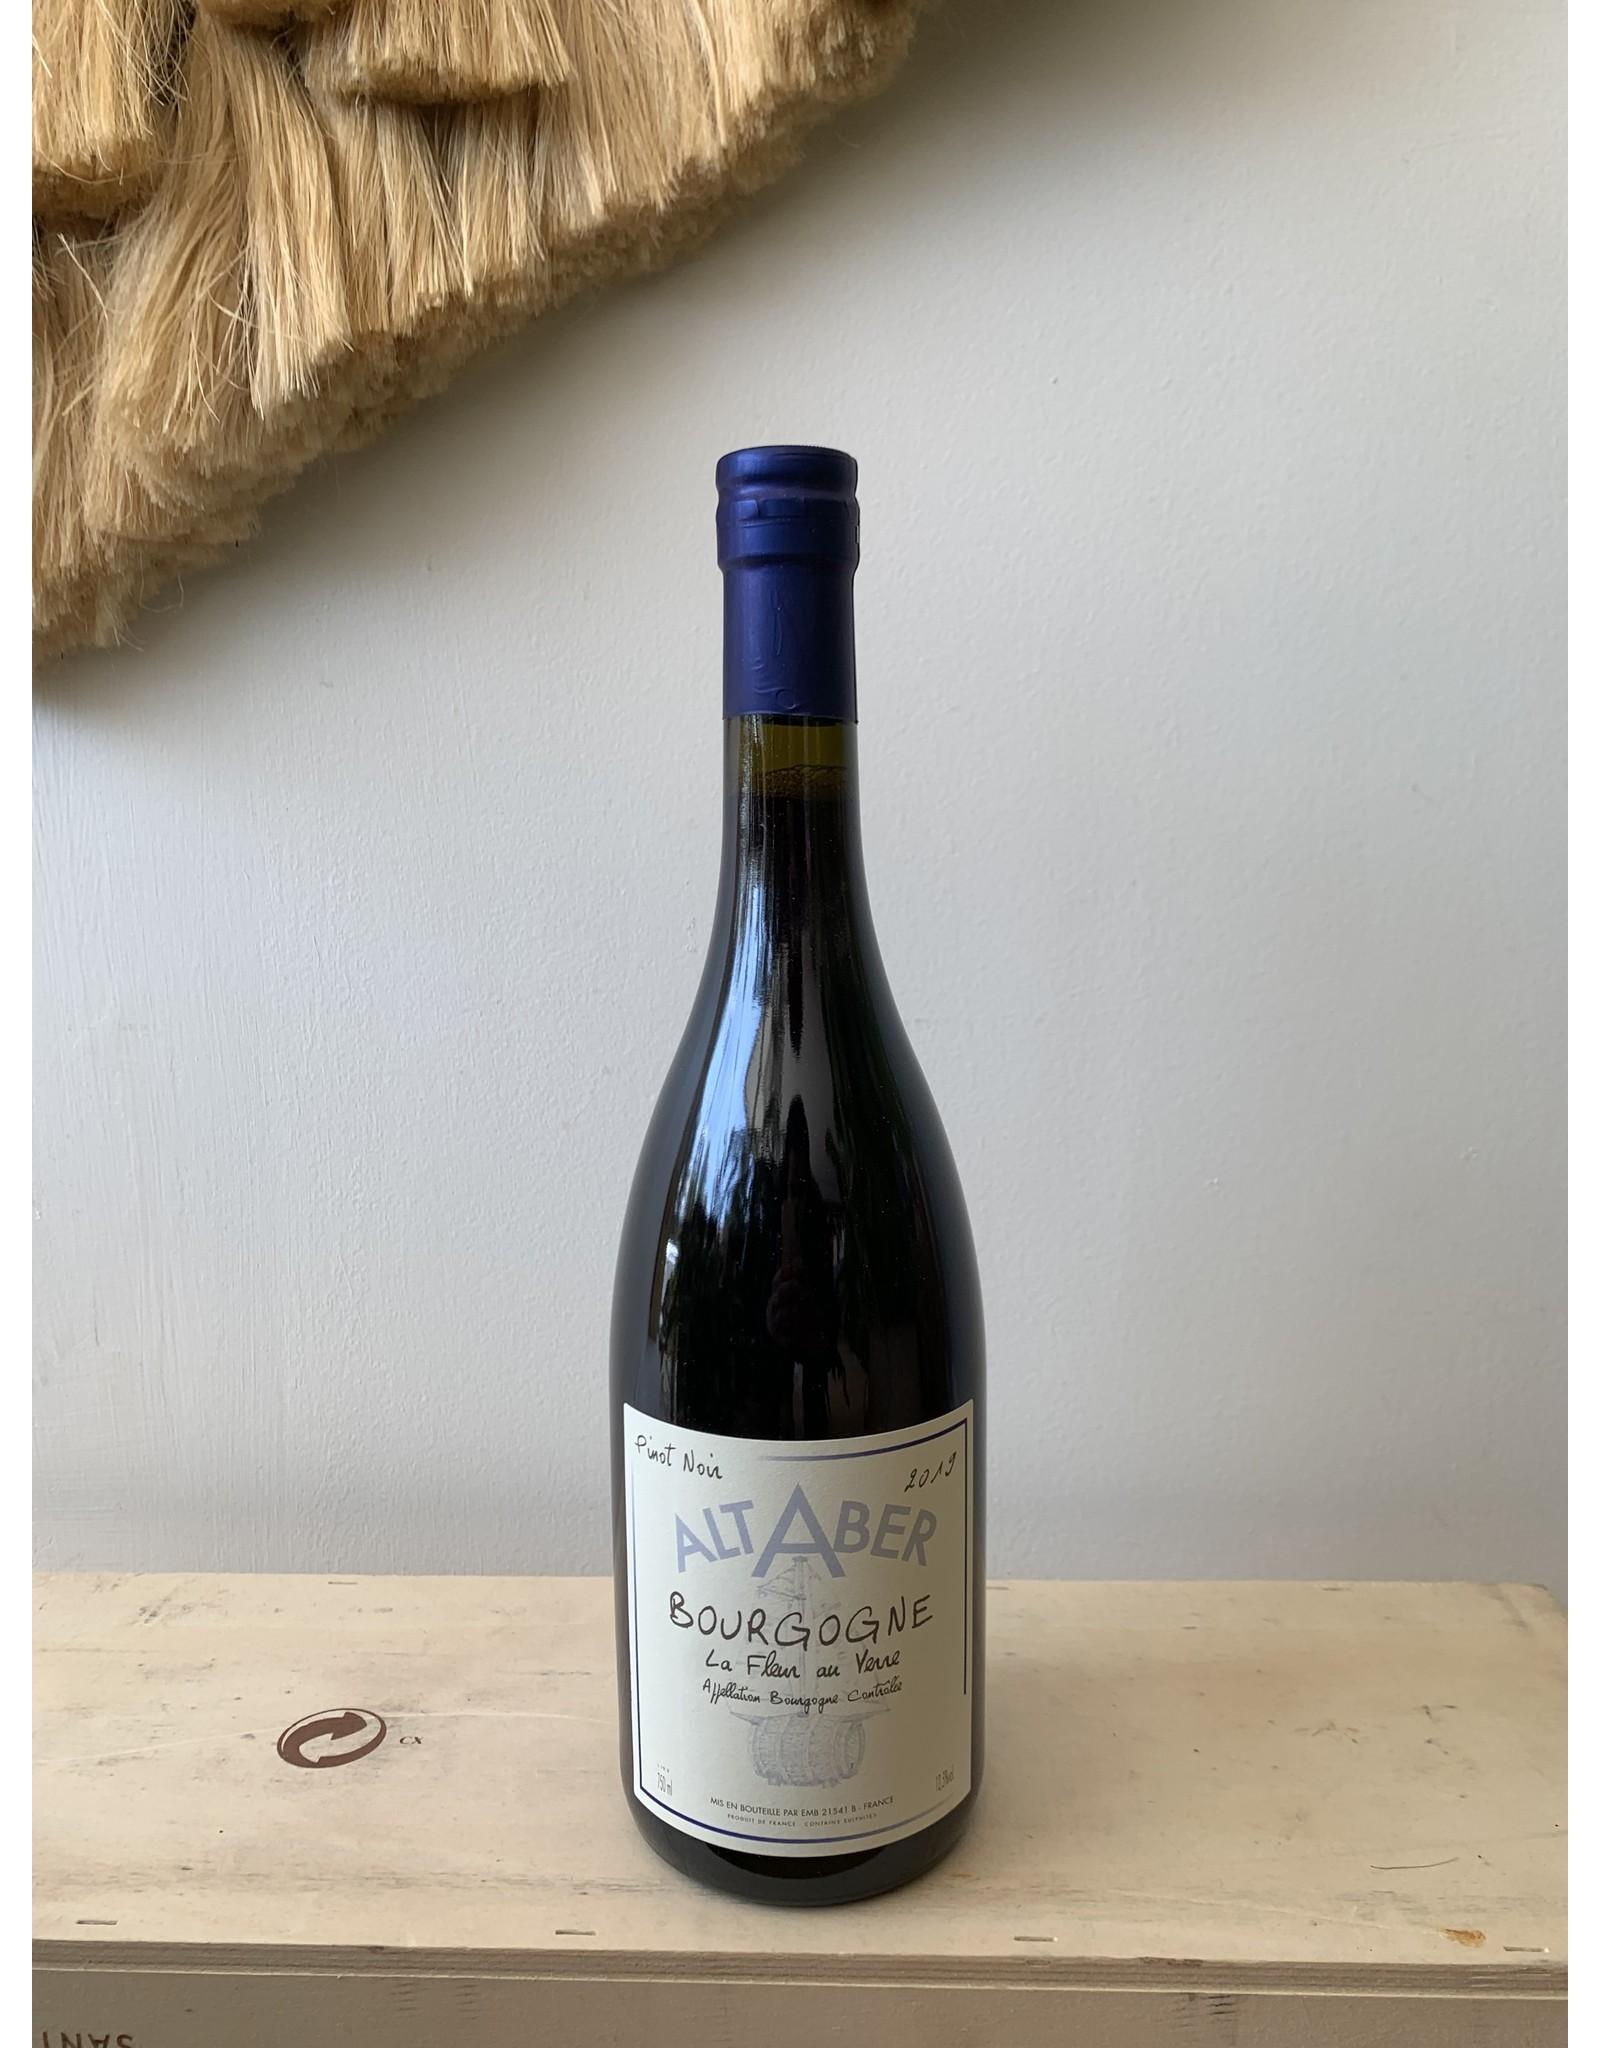 "Julien Altaber ""La Fleurau Verre"" Bourgogne Rouge 2019"